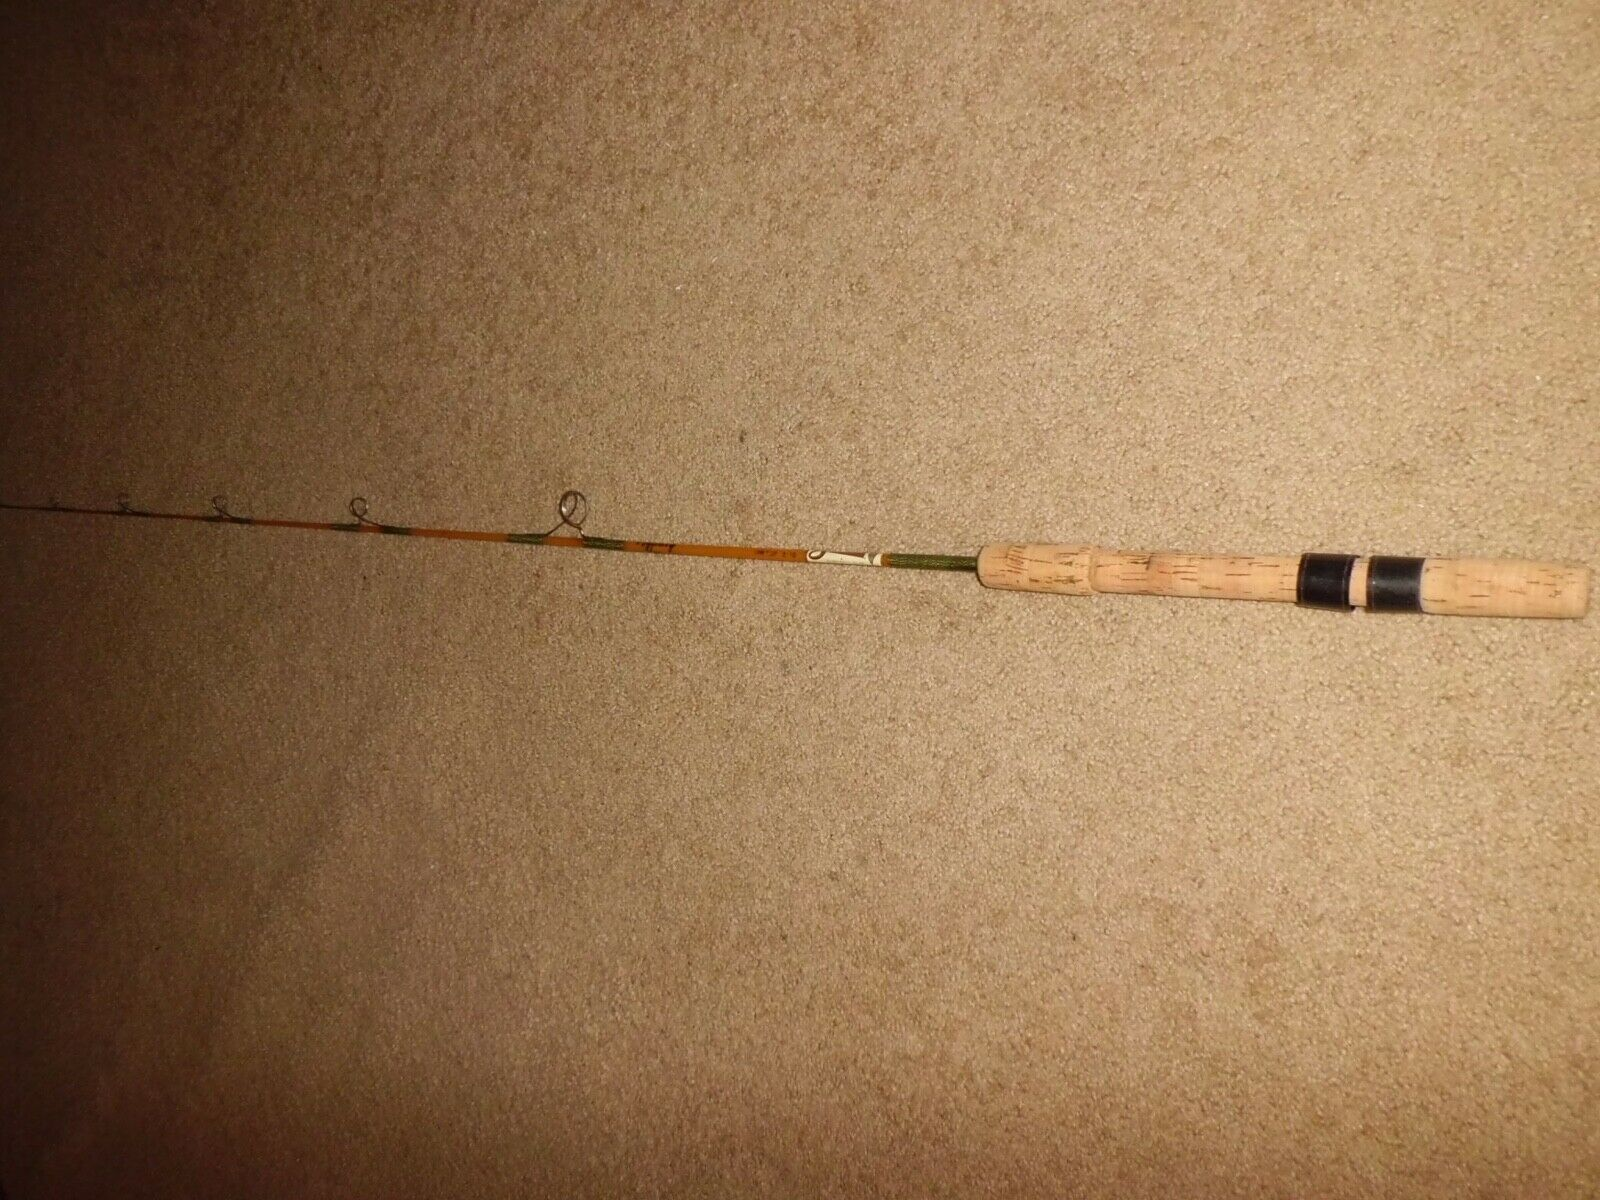 Vintage oren sabre nypoxy  1115 UL Spinning 5-1 2' Rod-USA-Test 2-10 LB